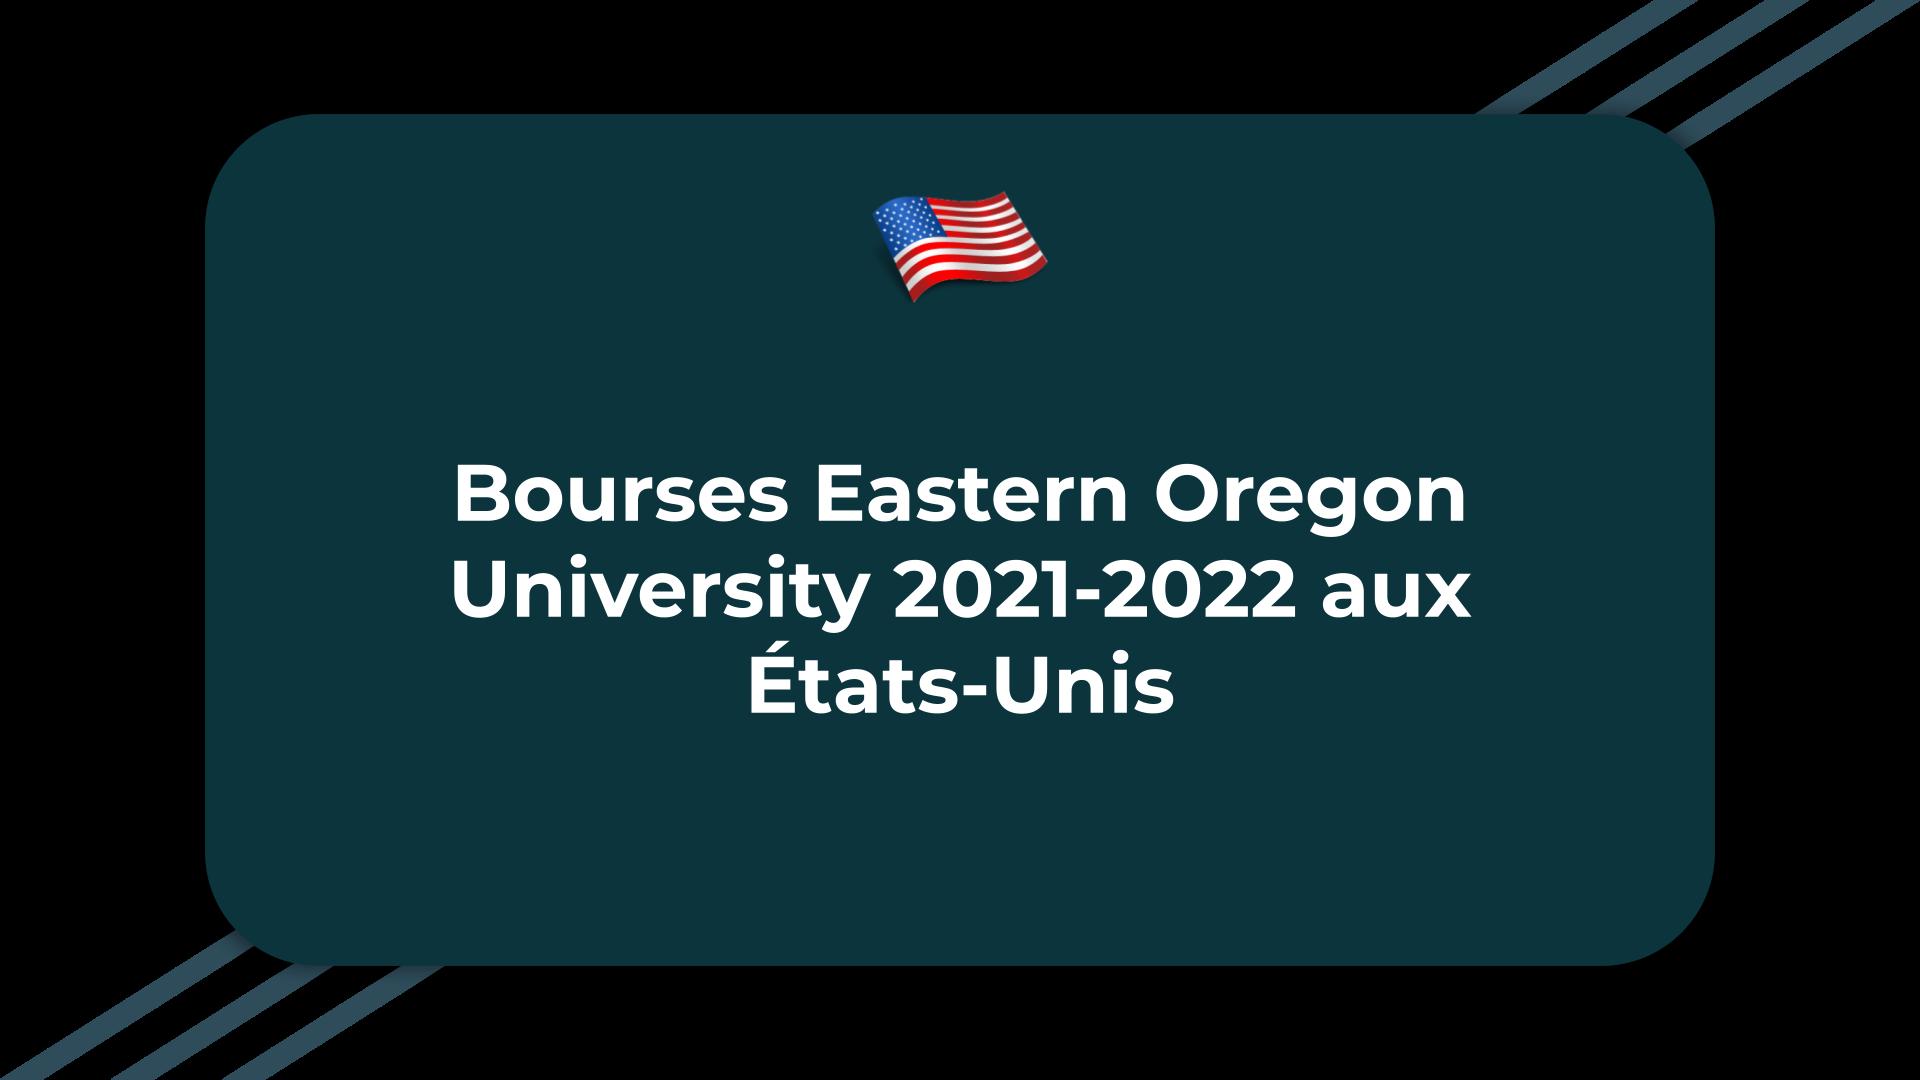 Bourses Eastern Oregon University